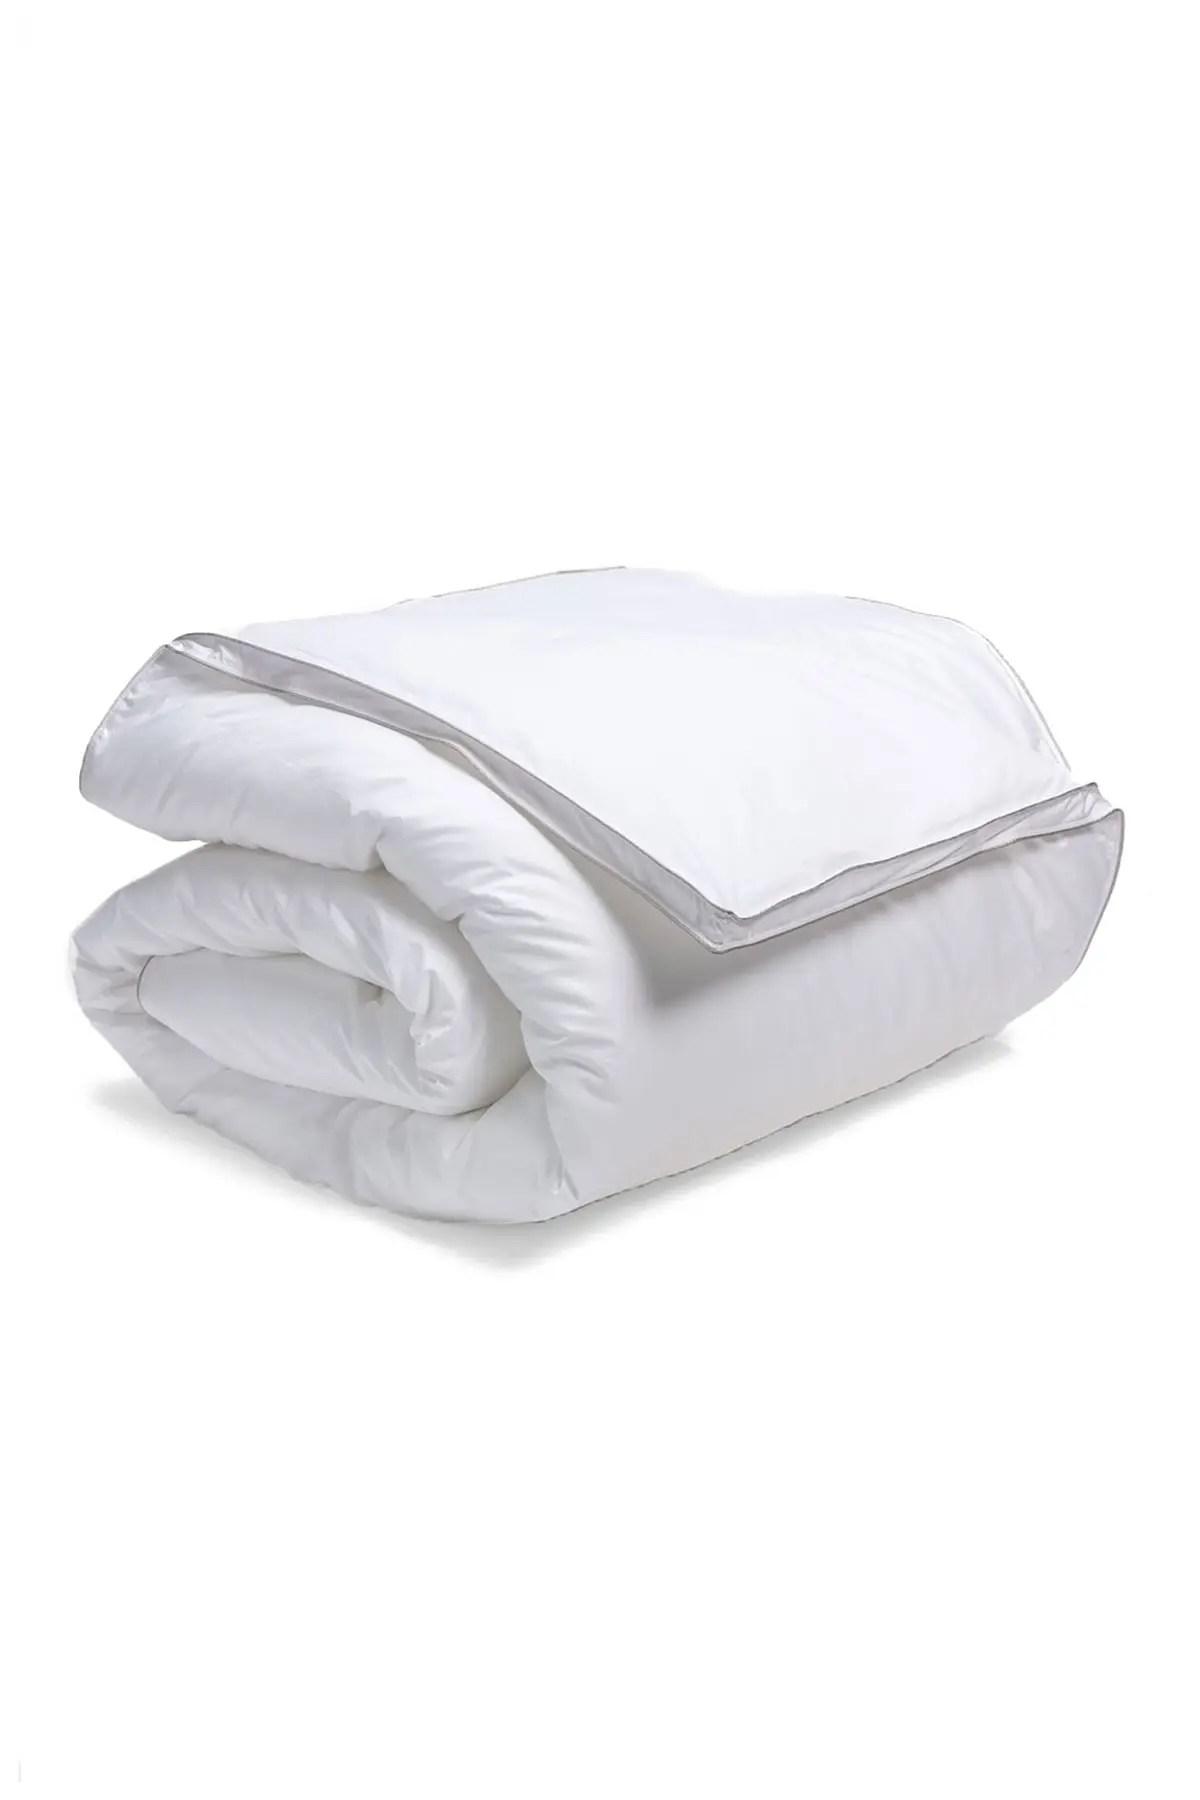 nordstrom rack white queen down alternative comforter nordstrom rack